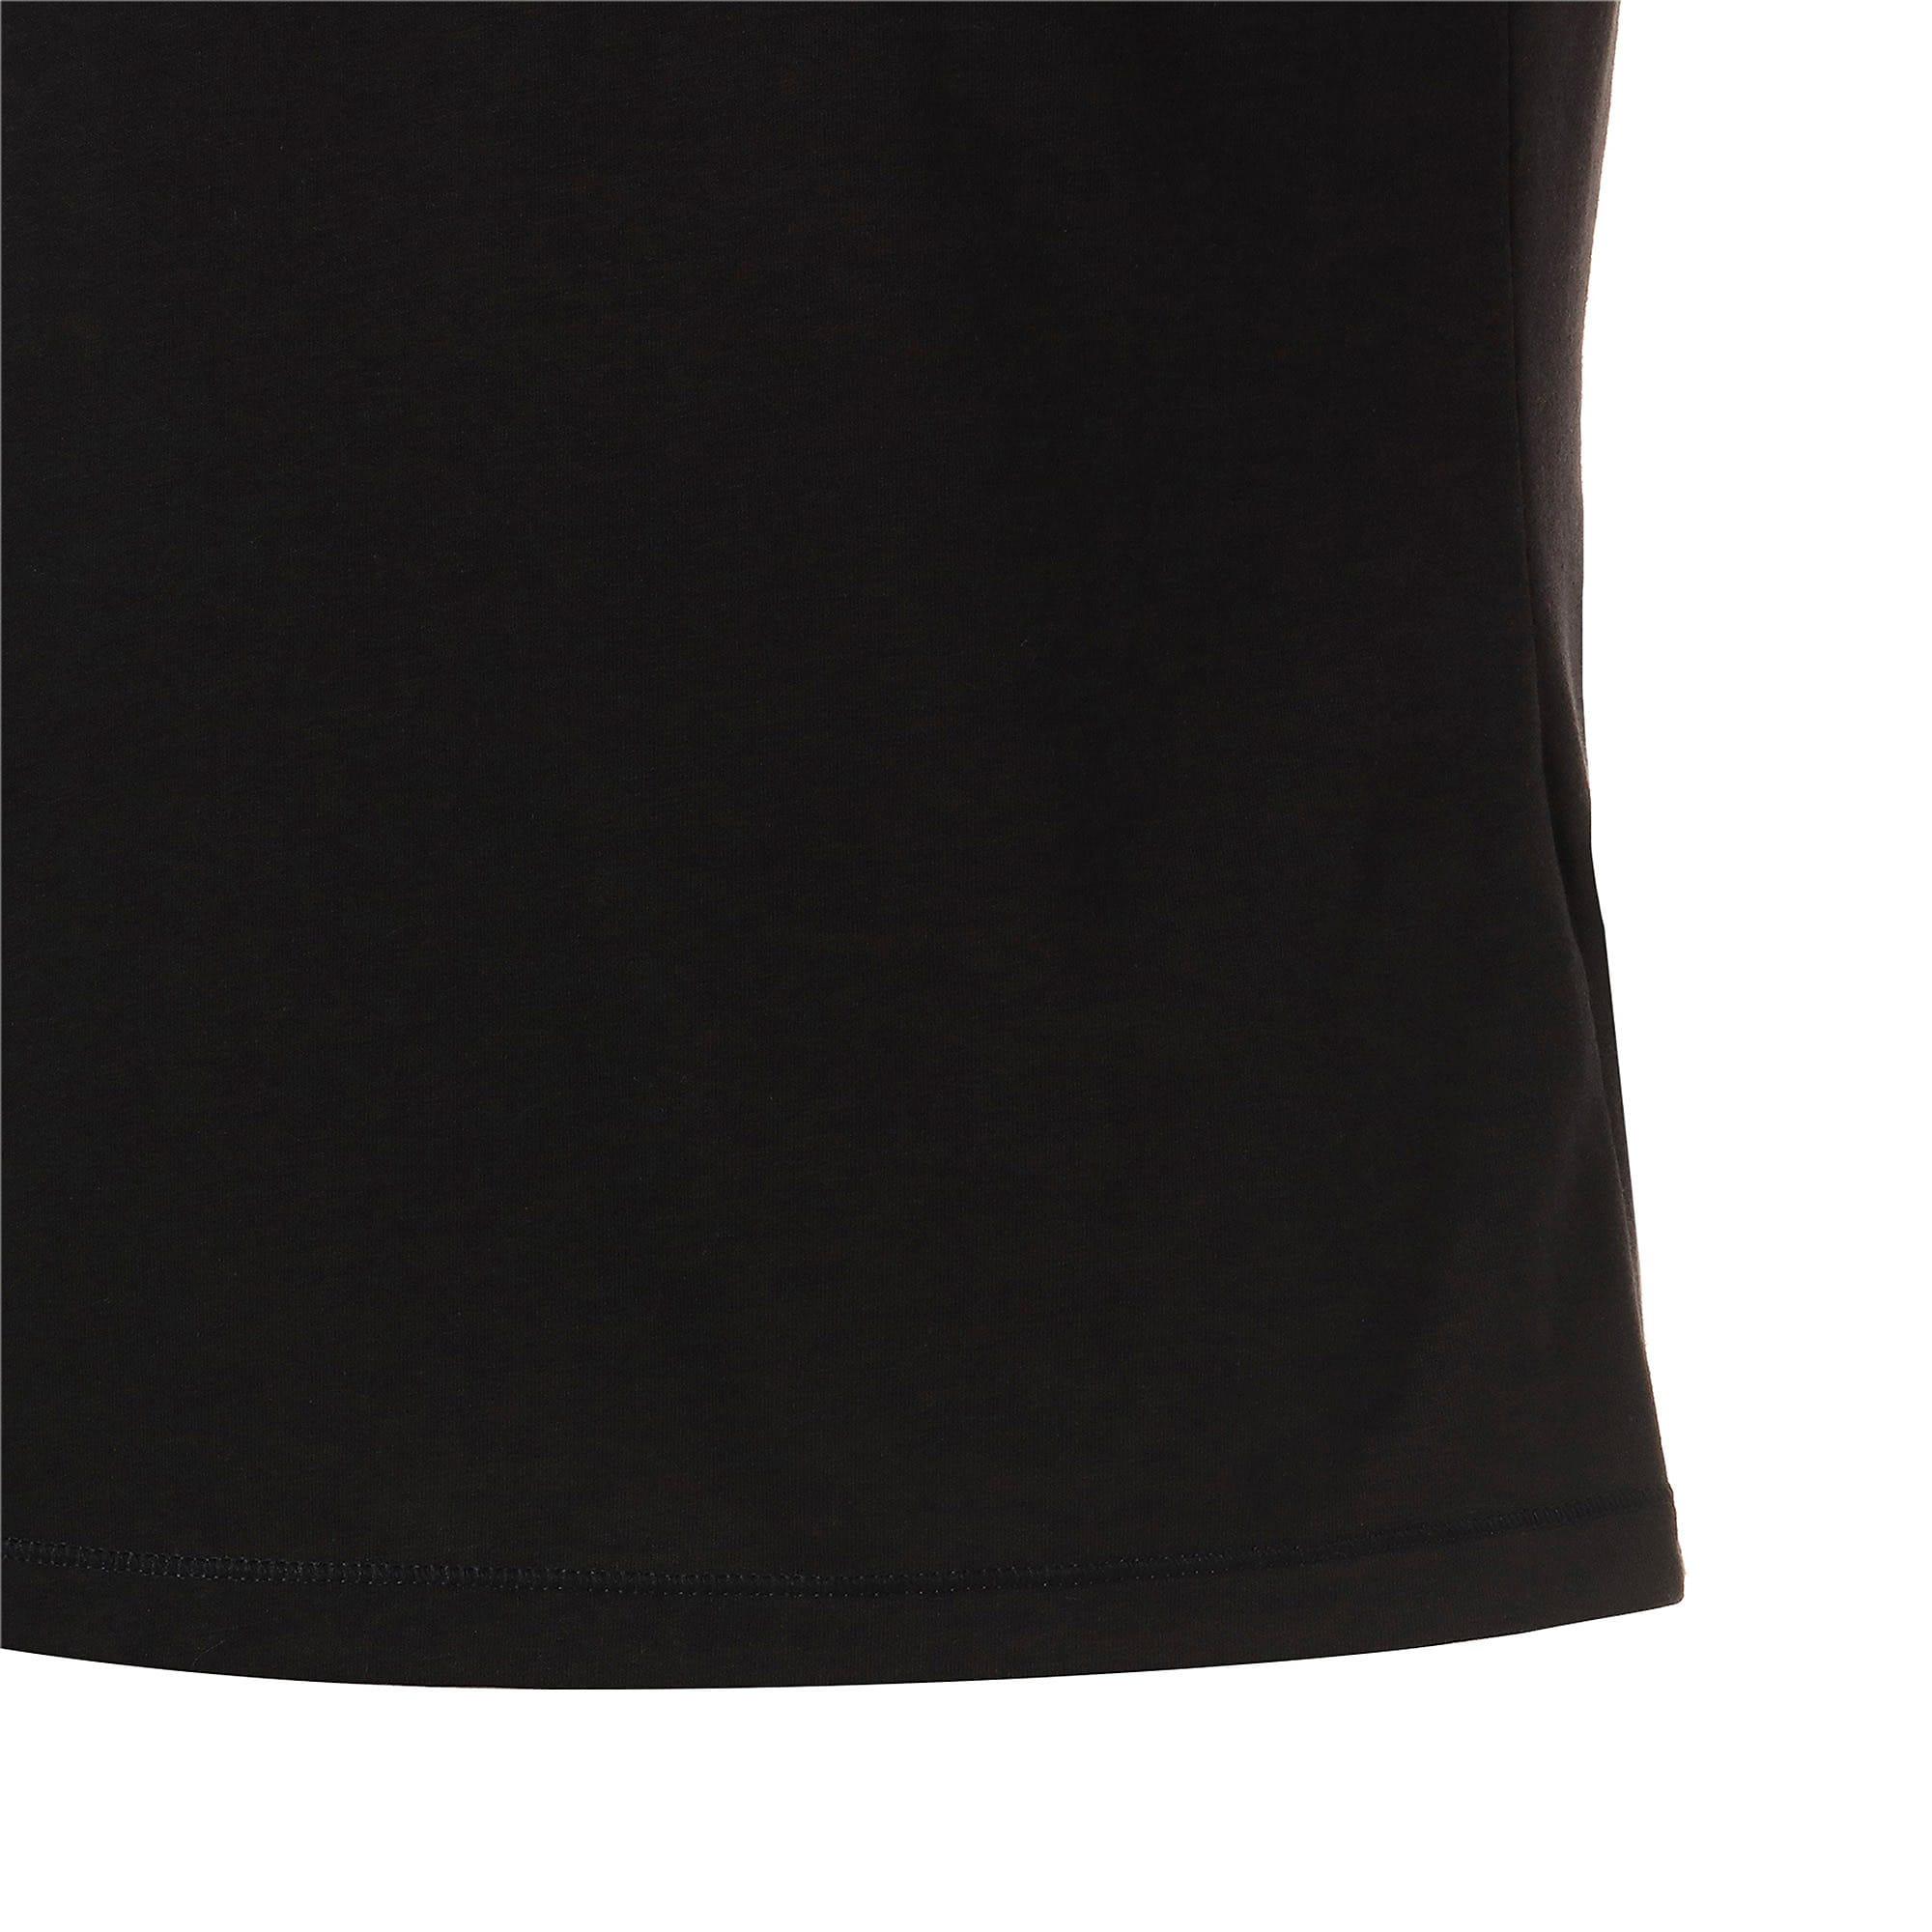 Thumbnail 9 of FAVORITE キャット SS ウィメンズ トレーニング Tシャツ 半袖, Puma Black-CAT Q3, medium-JPN